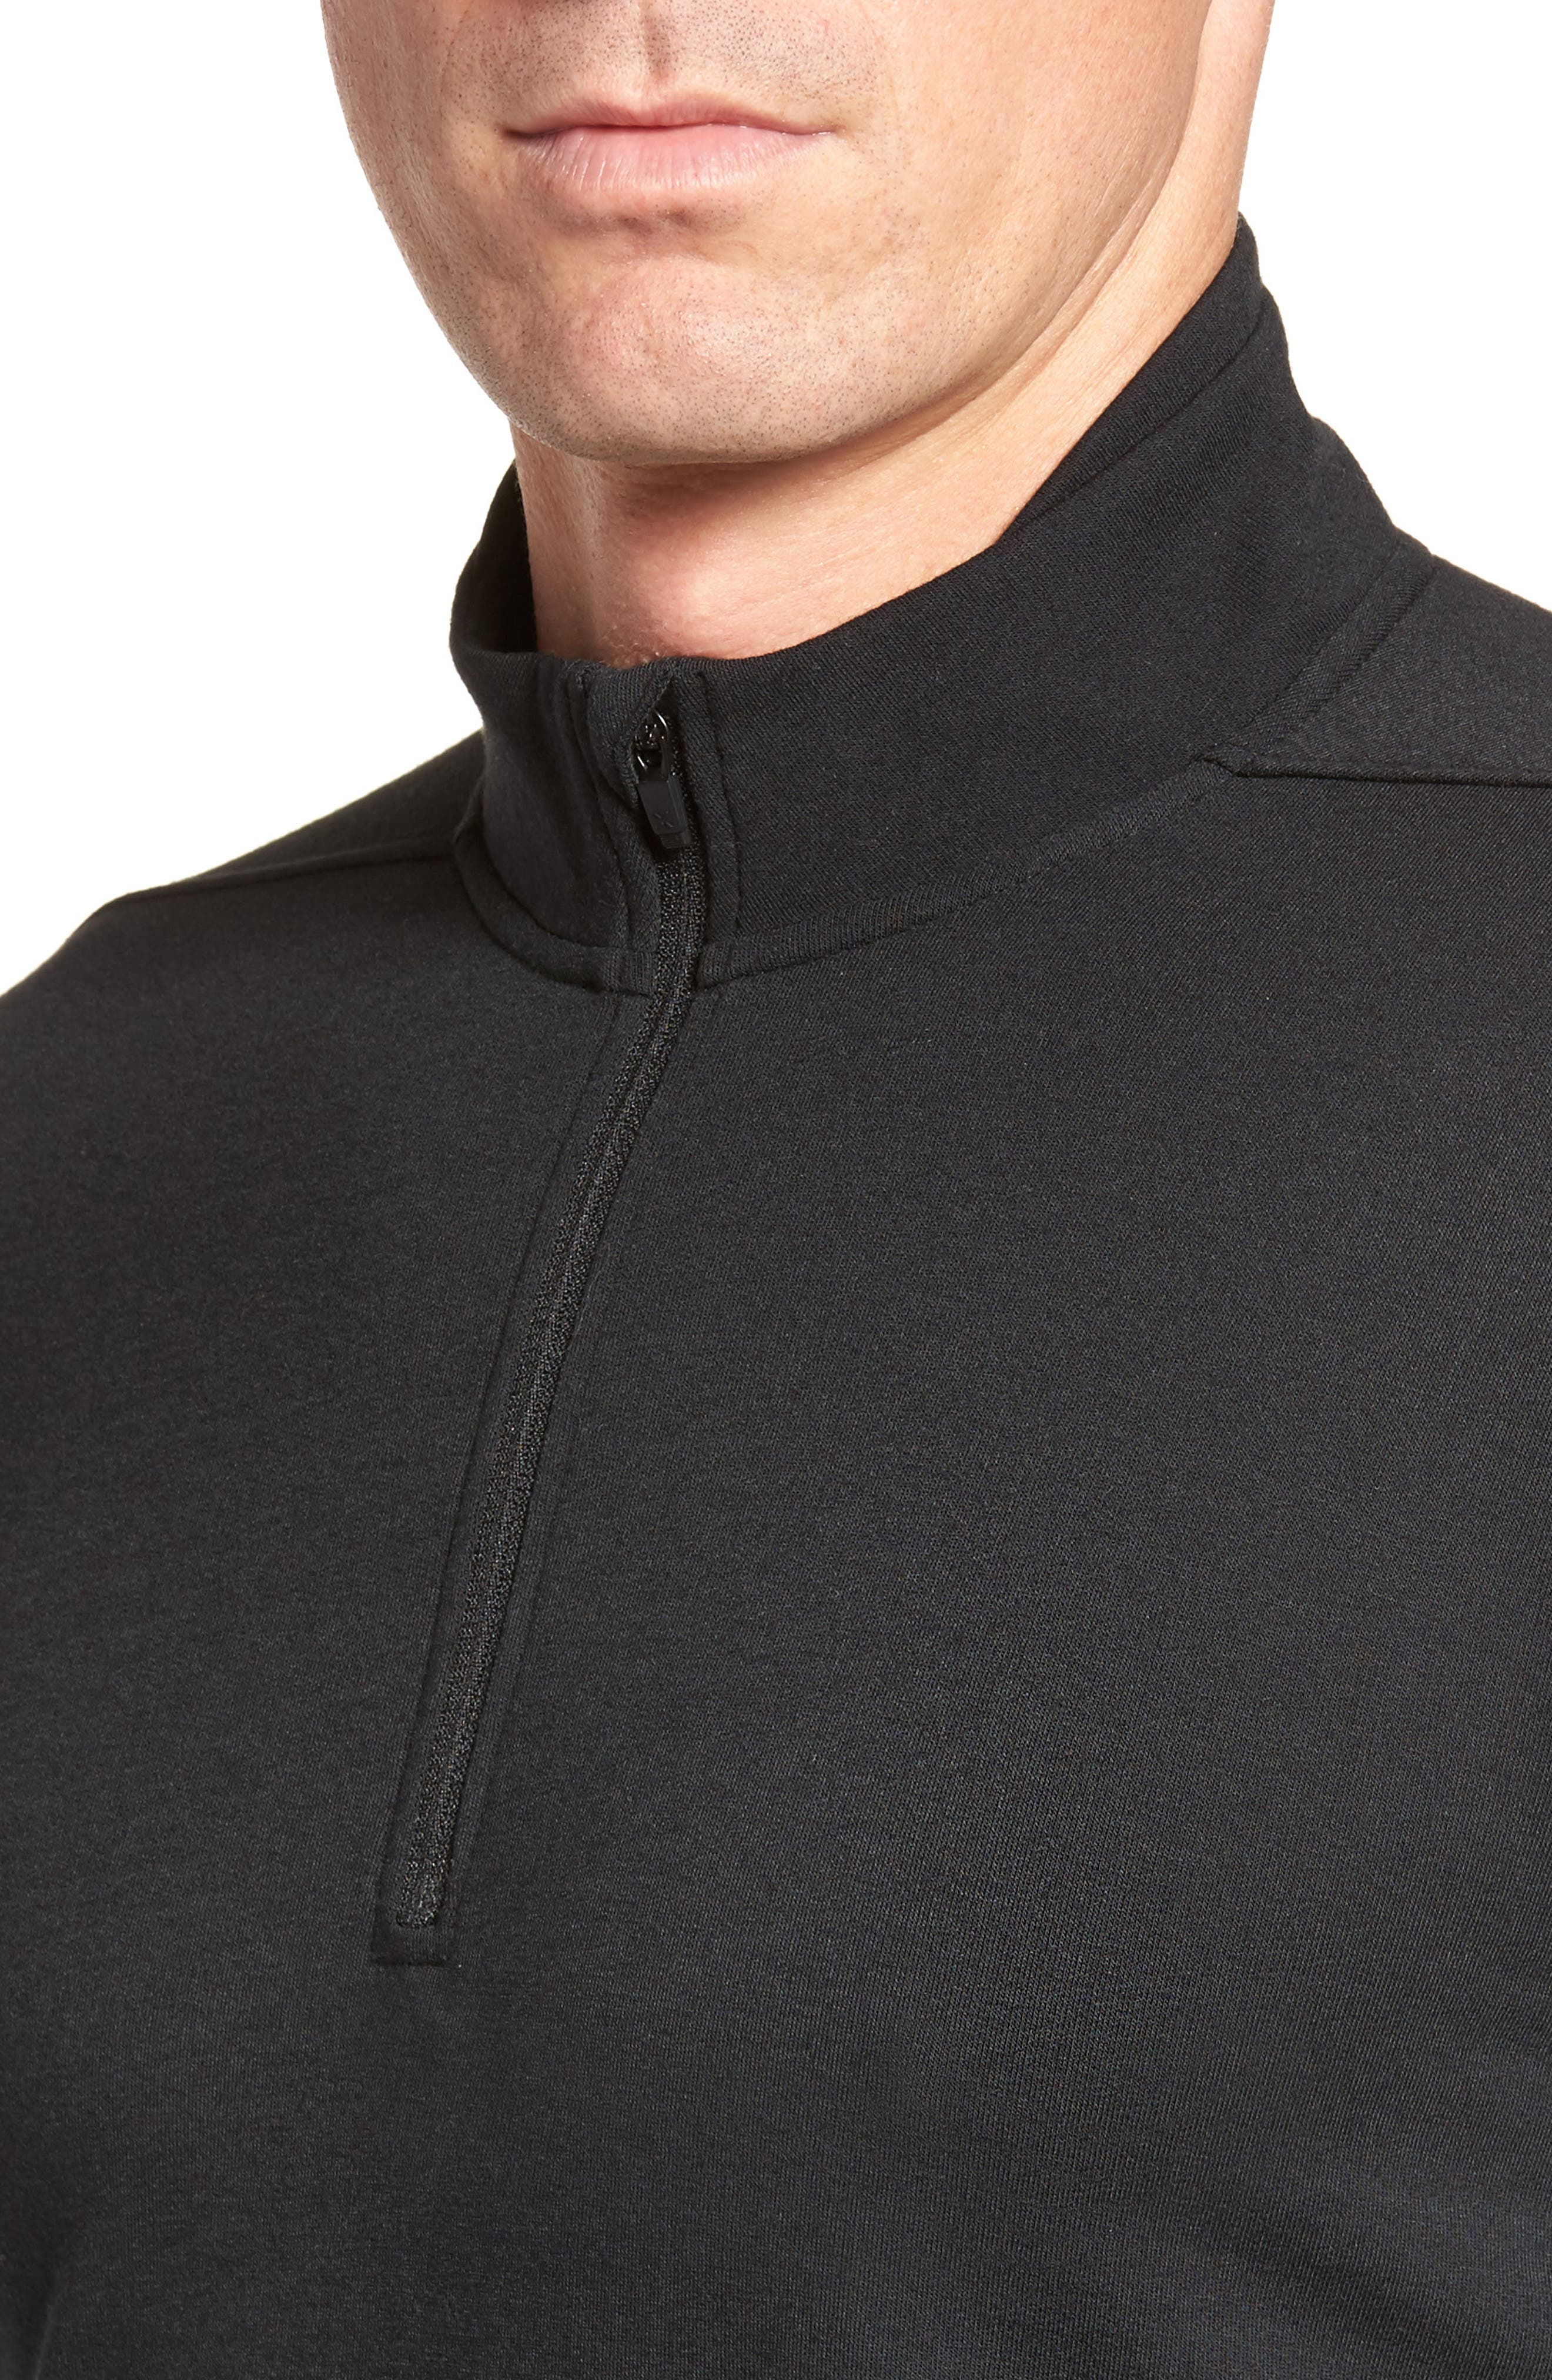 Distance Quarter Zip Pullover,                             Alternate thumbnail 4, color,                             Black